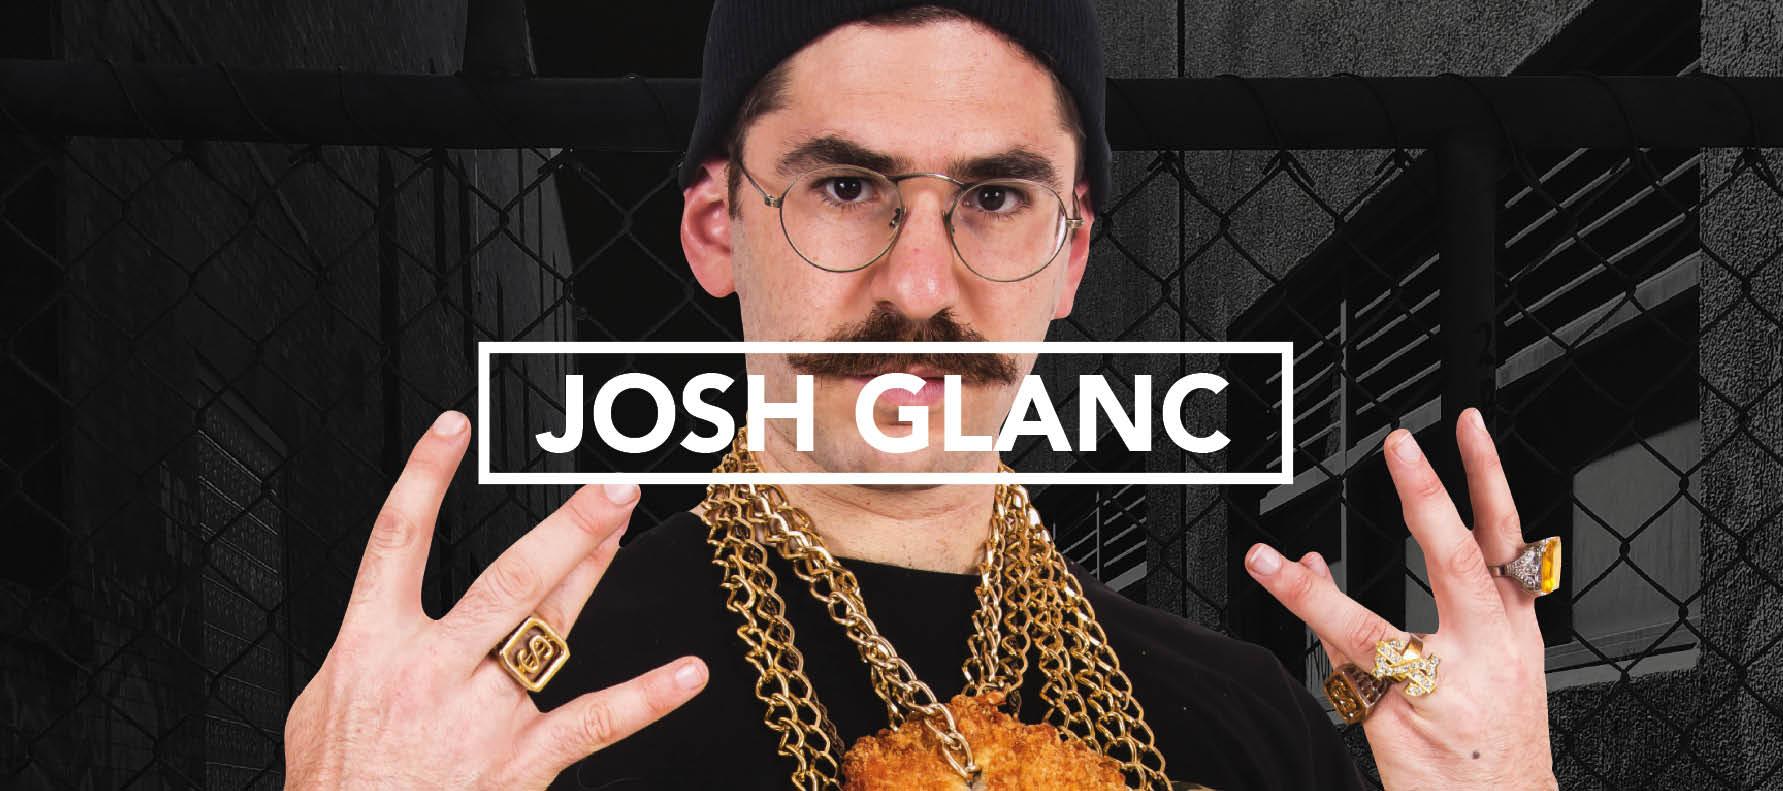 dead man label josh glanc